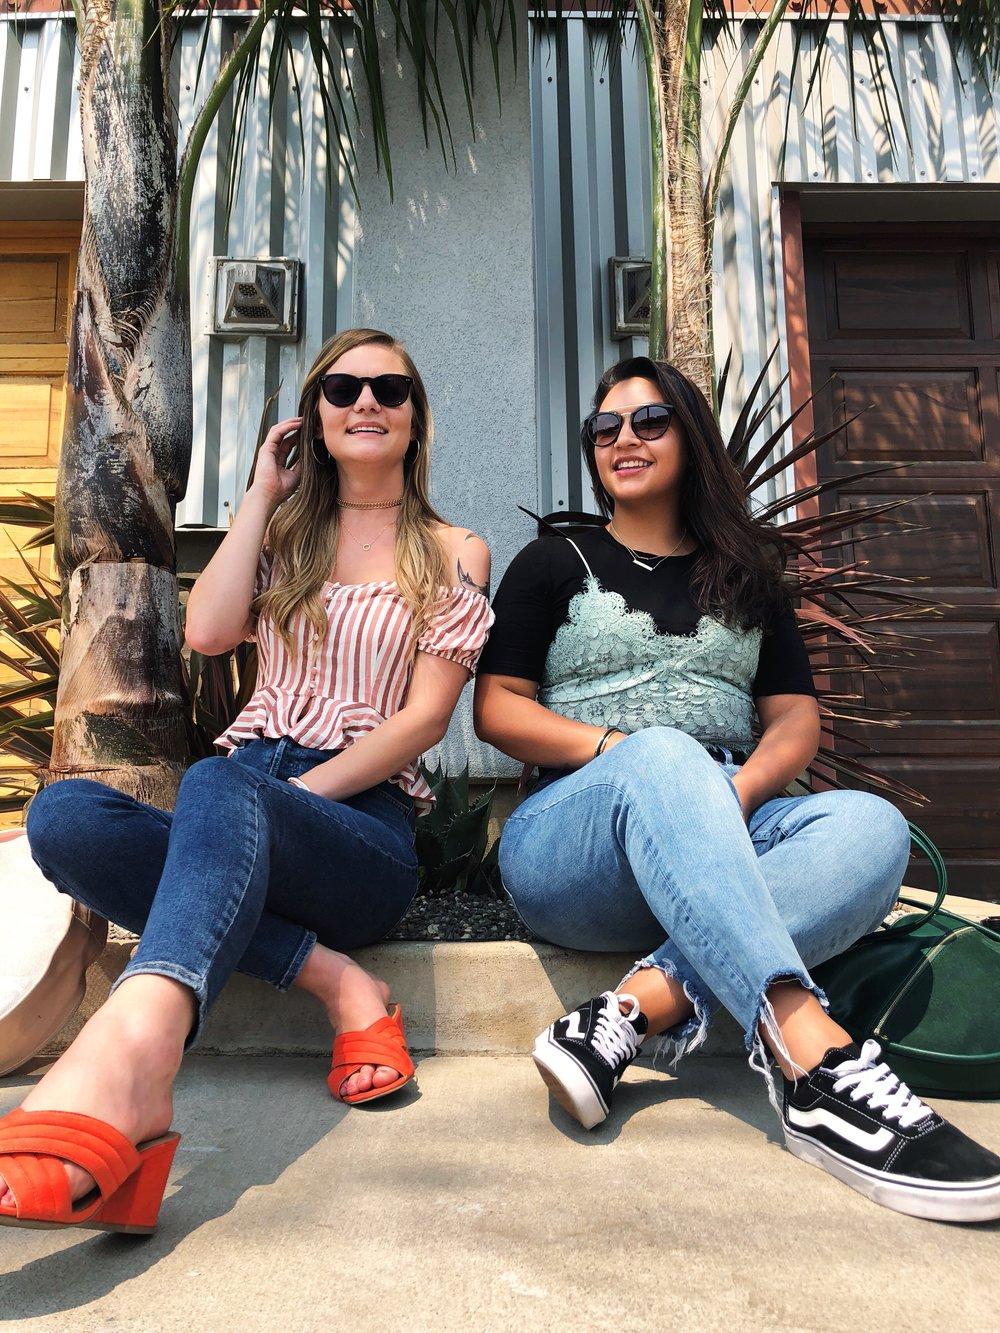 Summer Fashion, Dainty Jewelry, Street Style, Denim Jeans, Sunglasses, Canadian Company, Shop Small